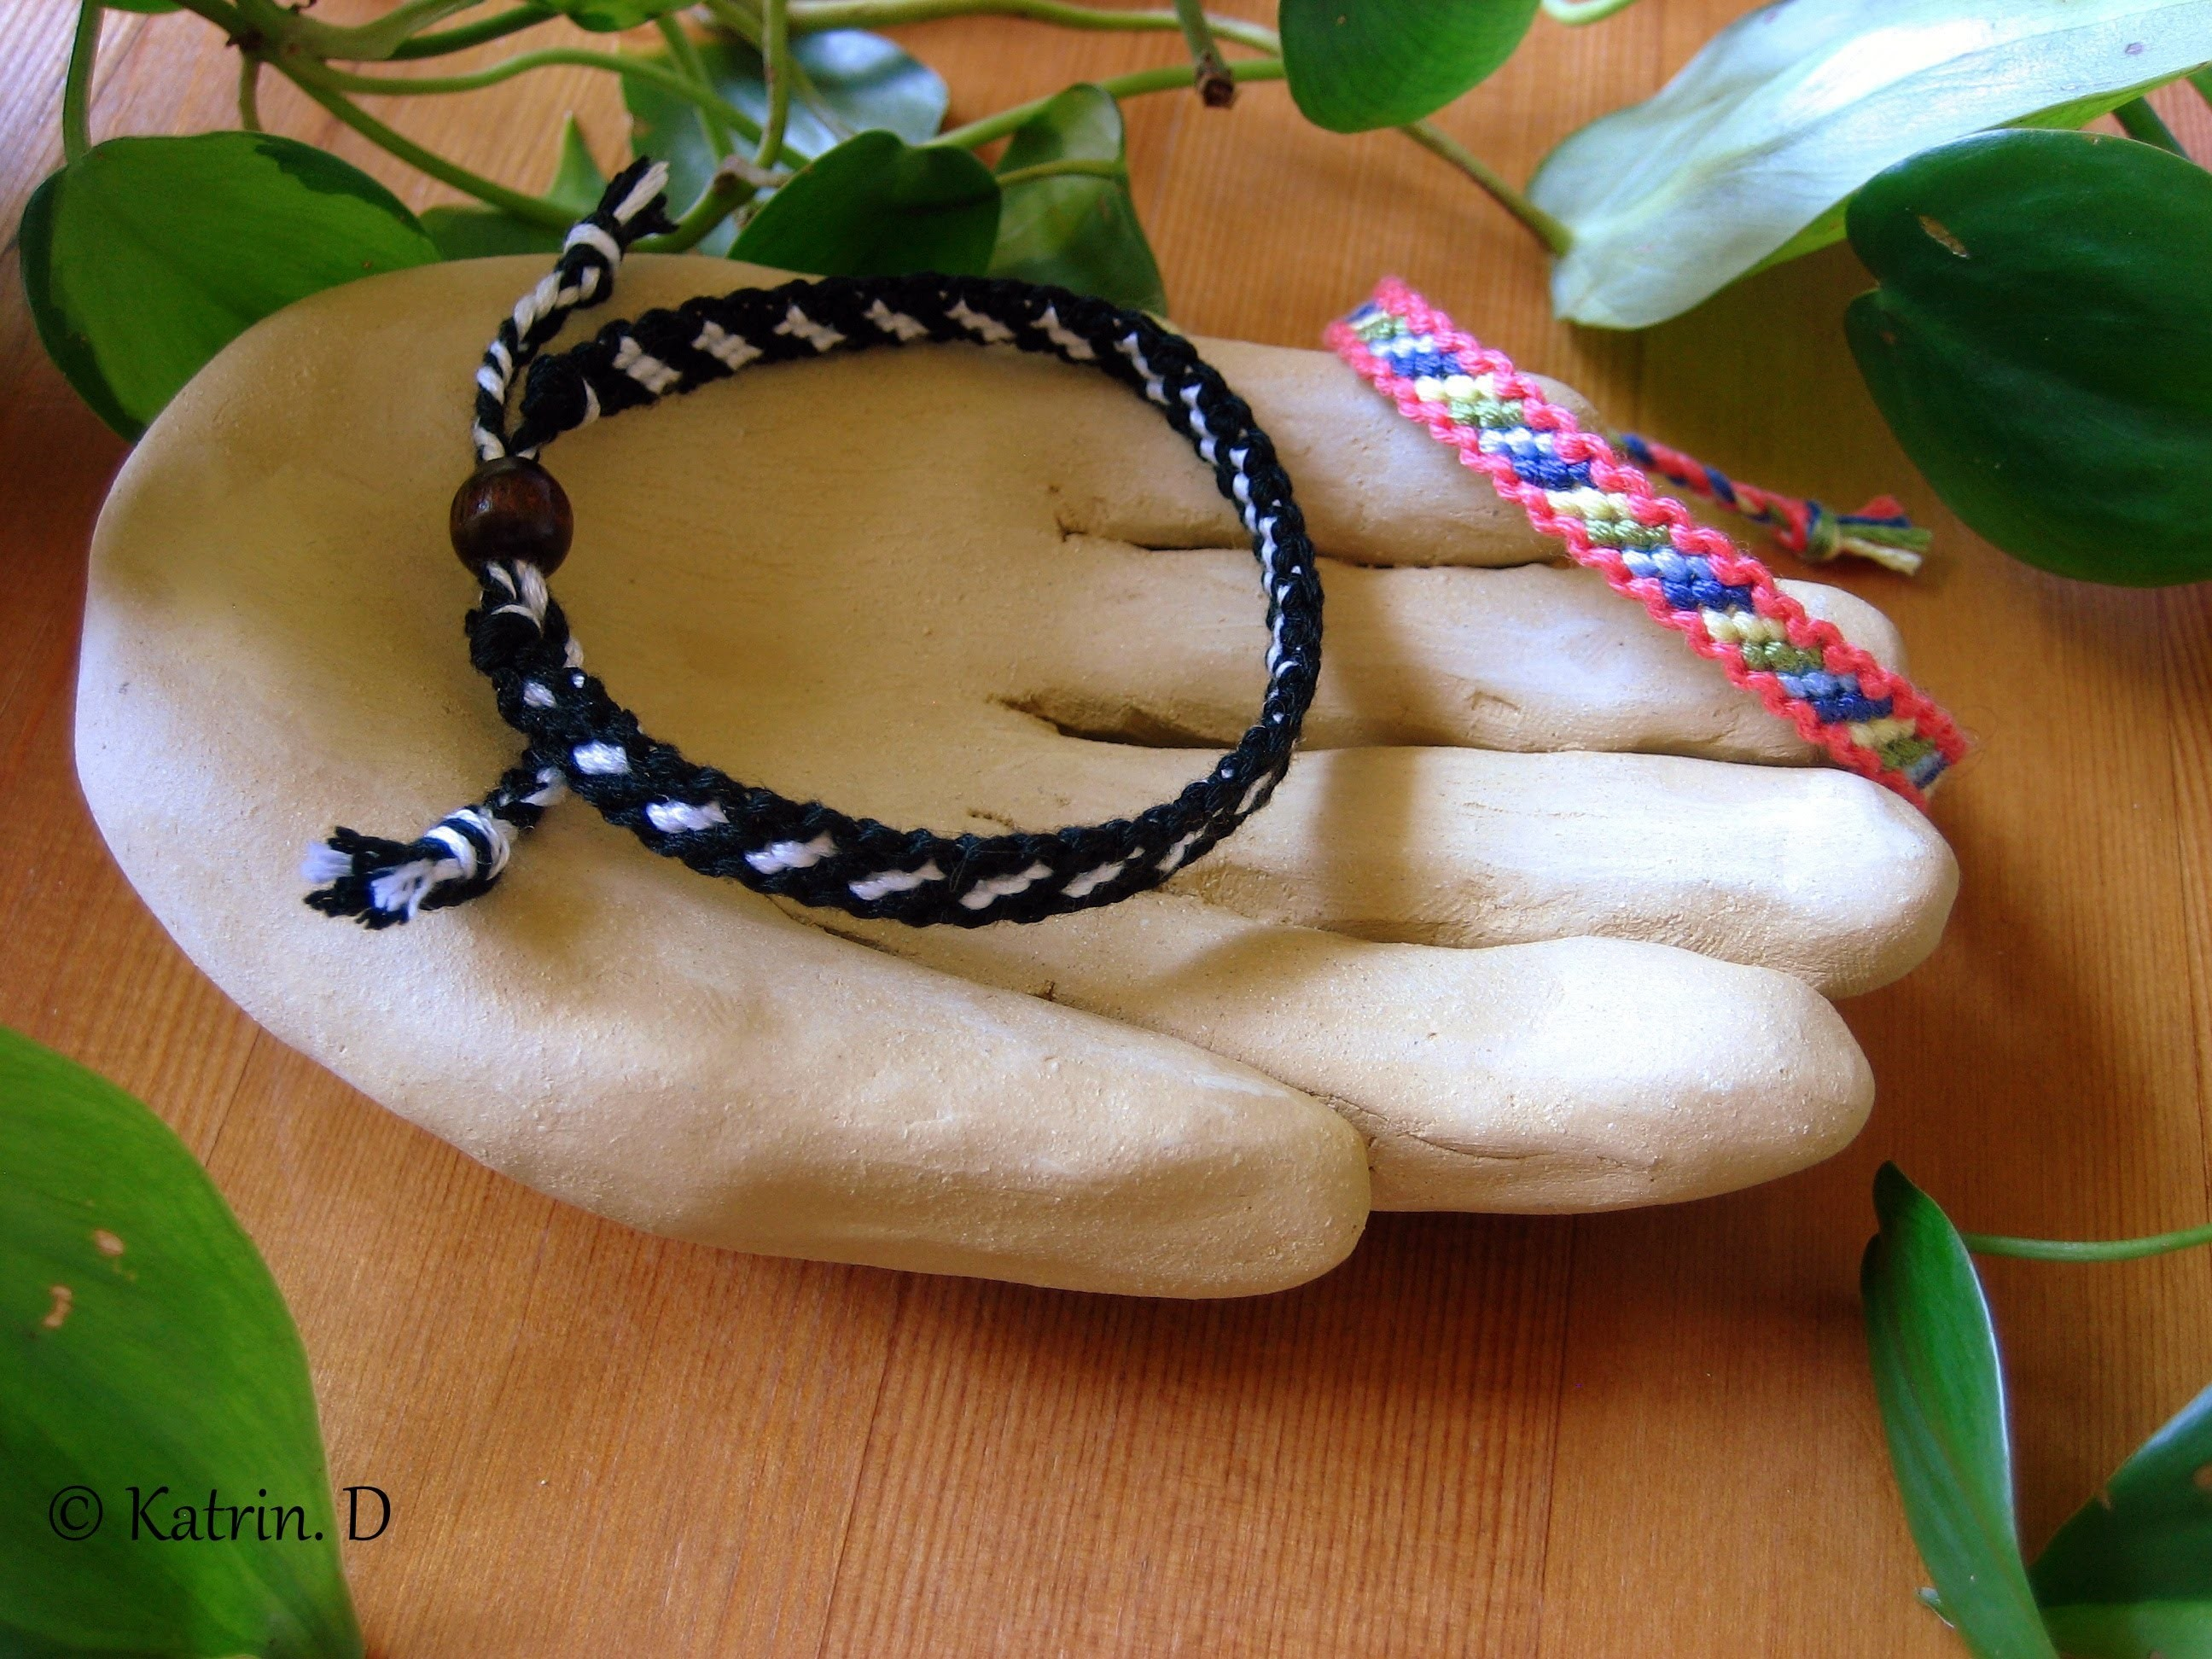 Bordered Candy Stripe Friendship Bracelet